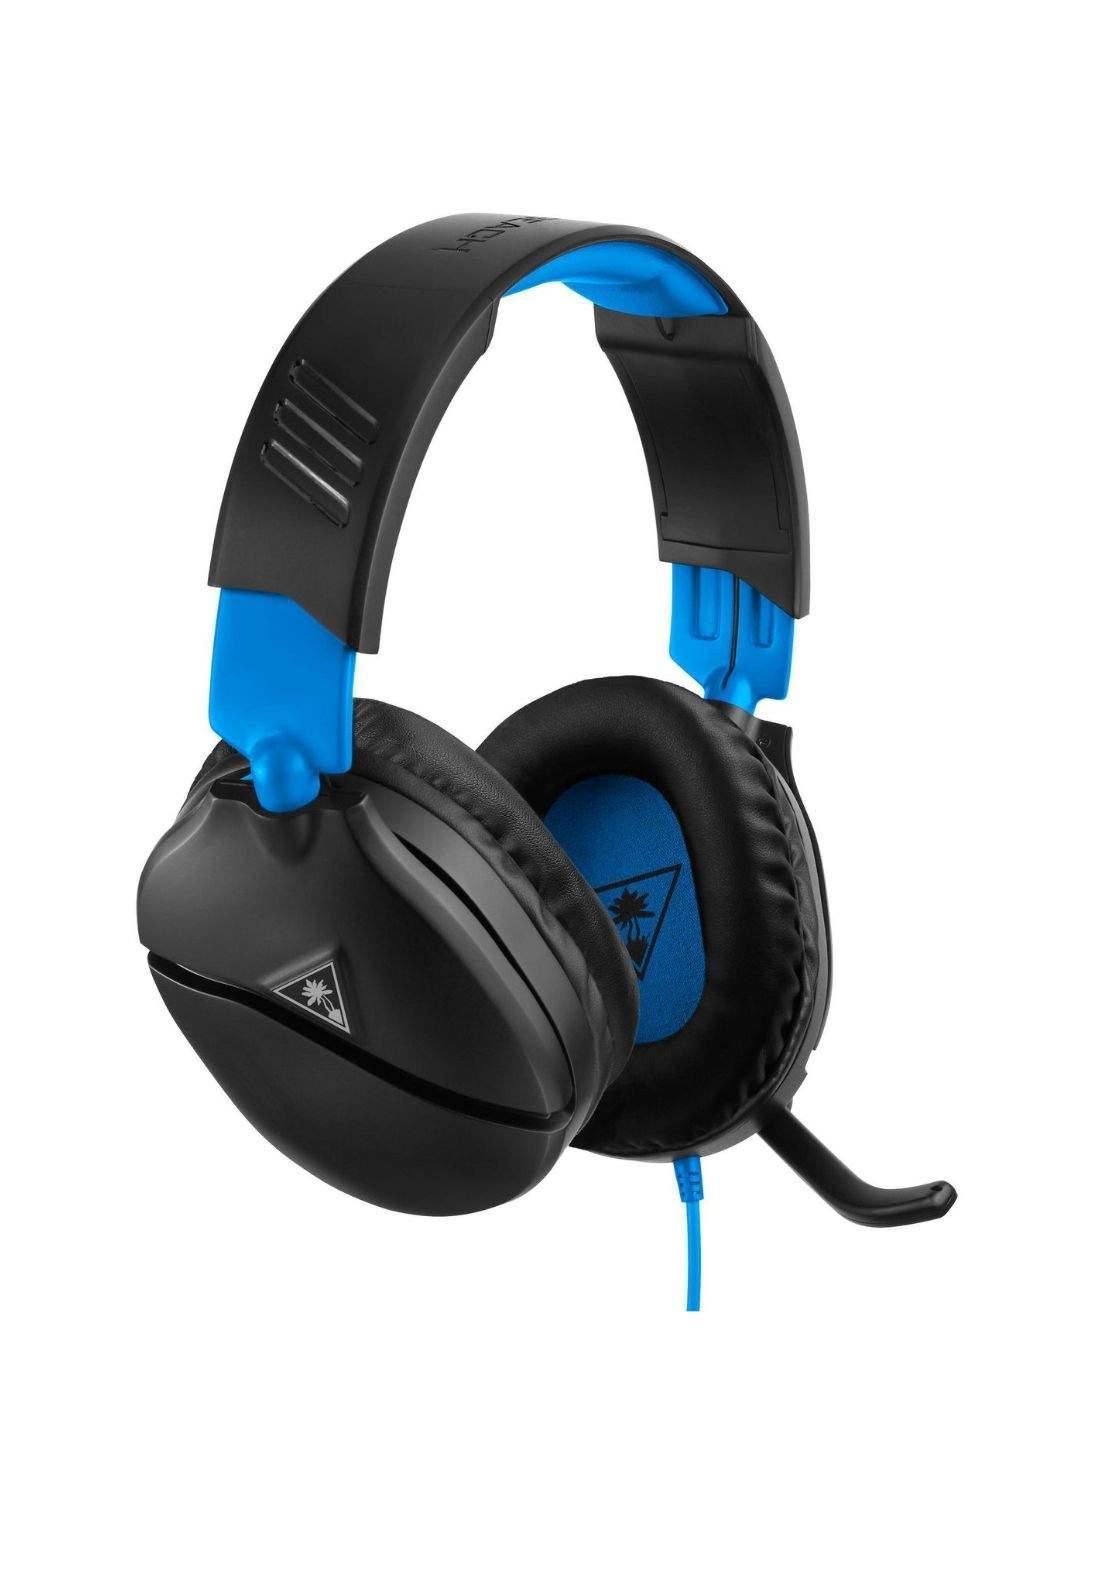 Turtle Beach Recon 70 gaming headset - Black  سماعة